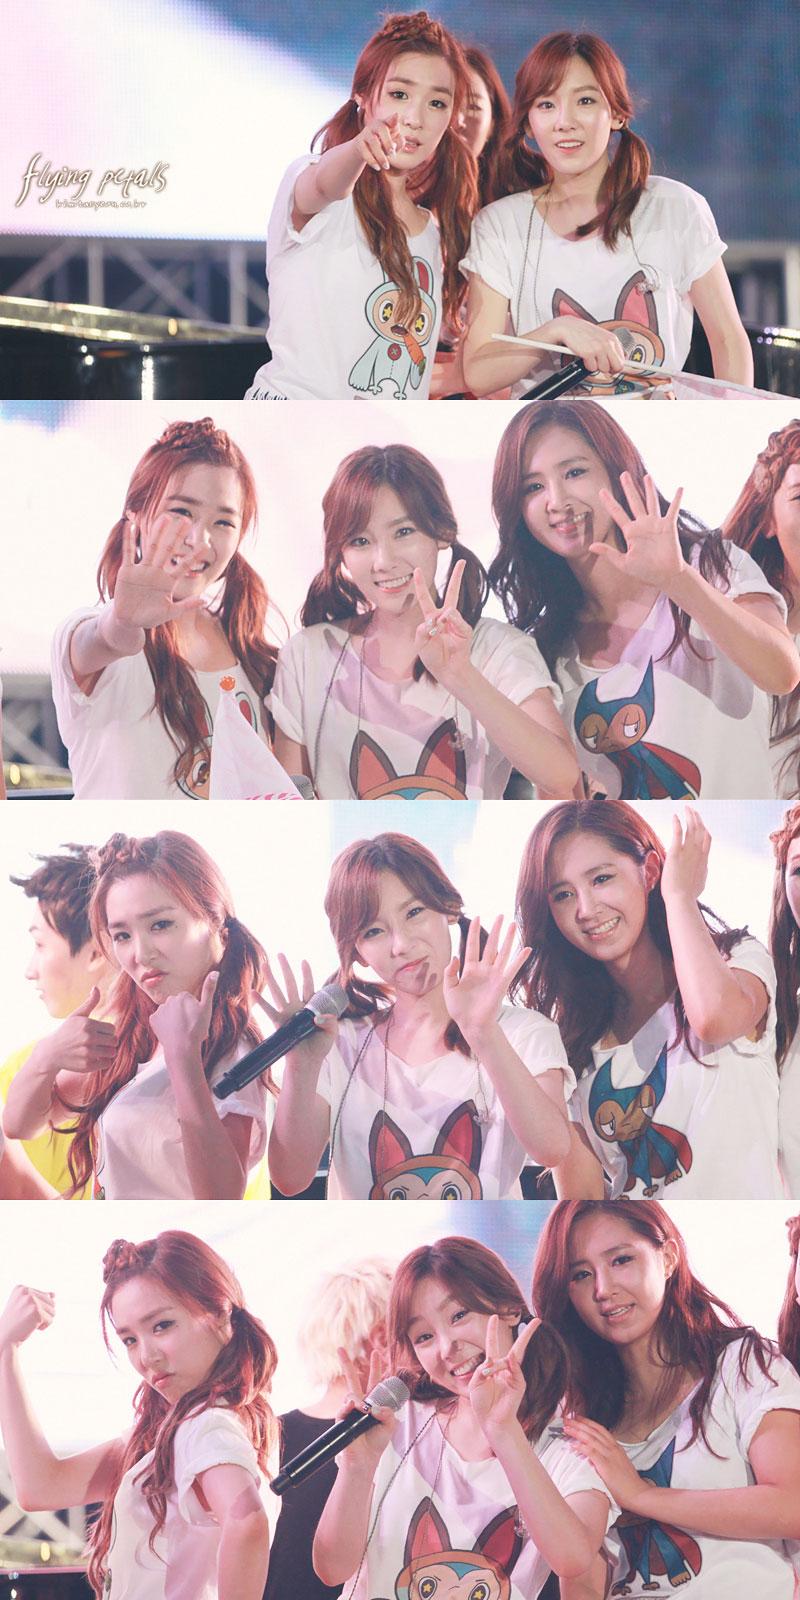 Taeyeon focus @ SMTown Live in Seoul 2012